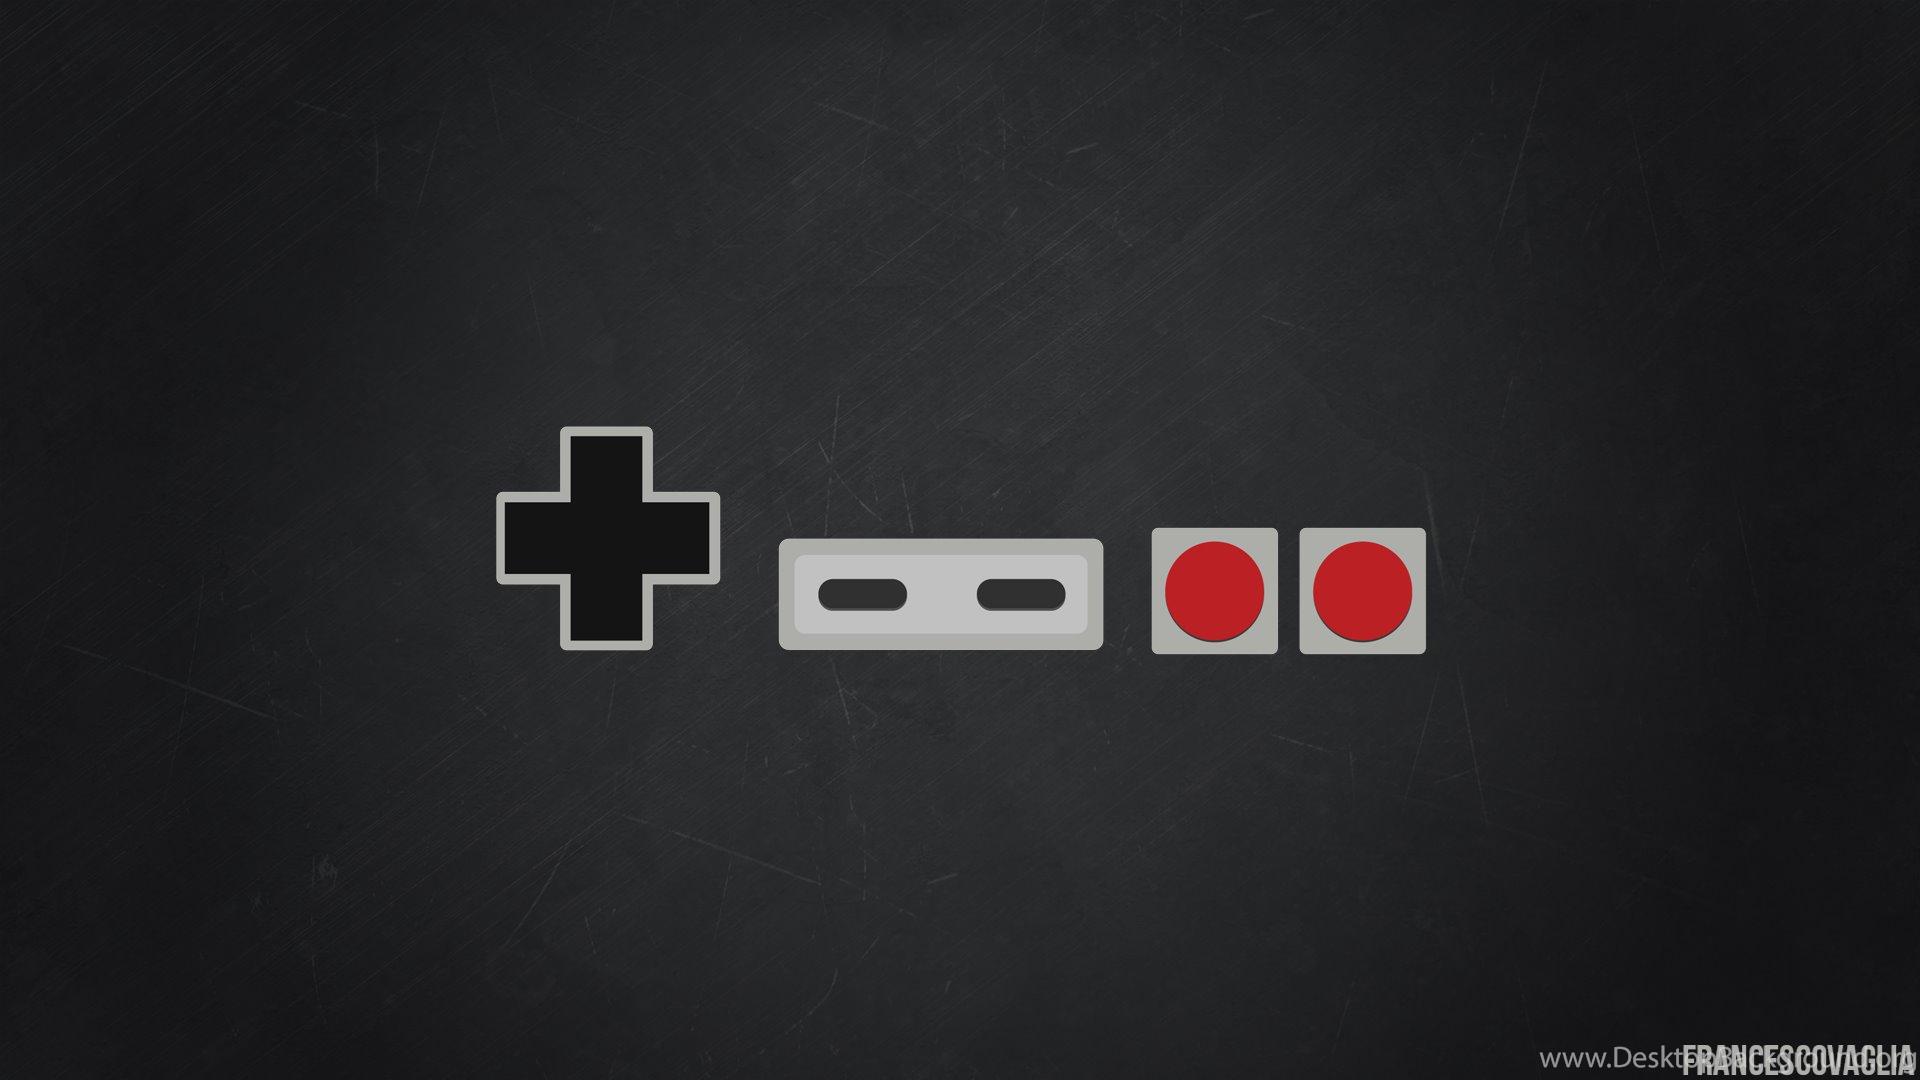 Nintendo nes controller minimal wallpapers 1080p by - Nes wallpaper ...